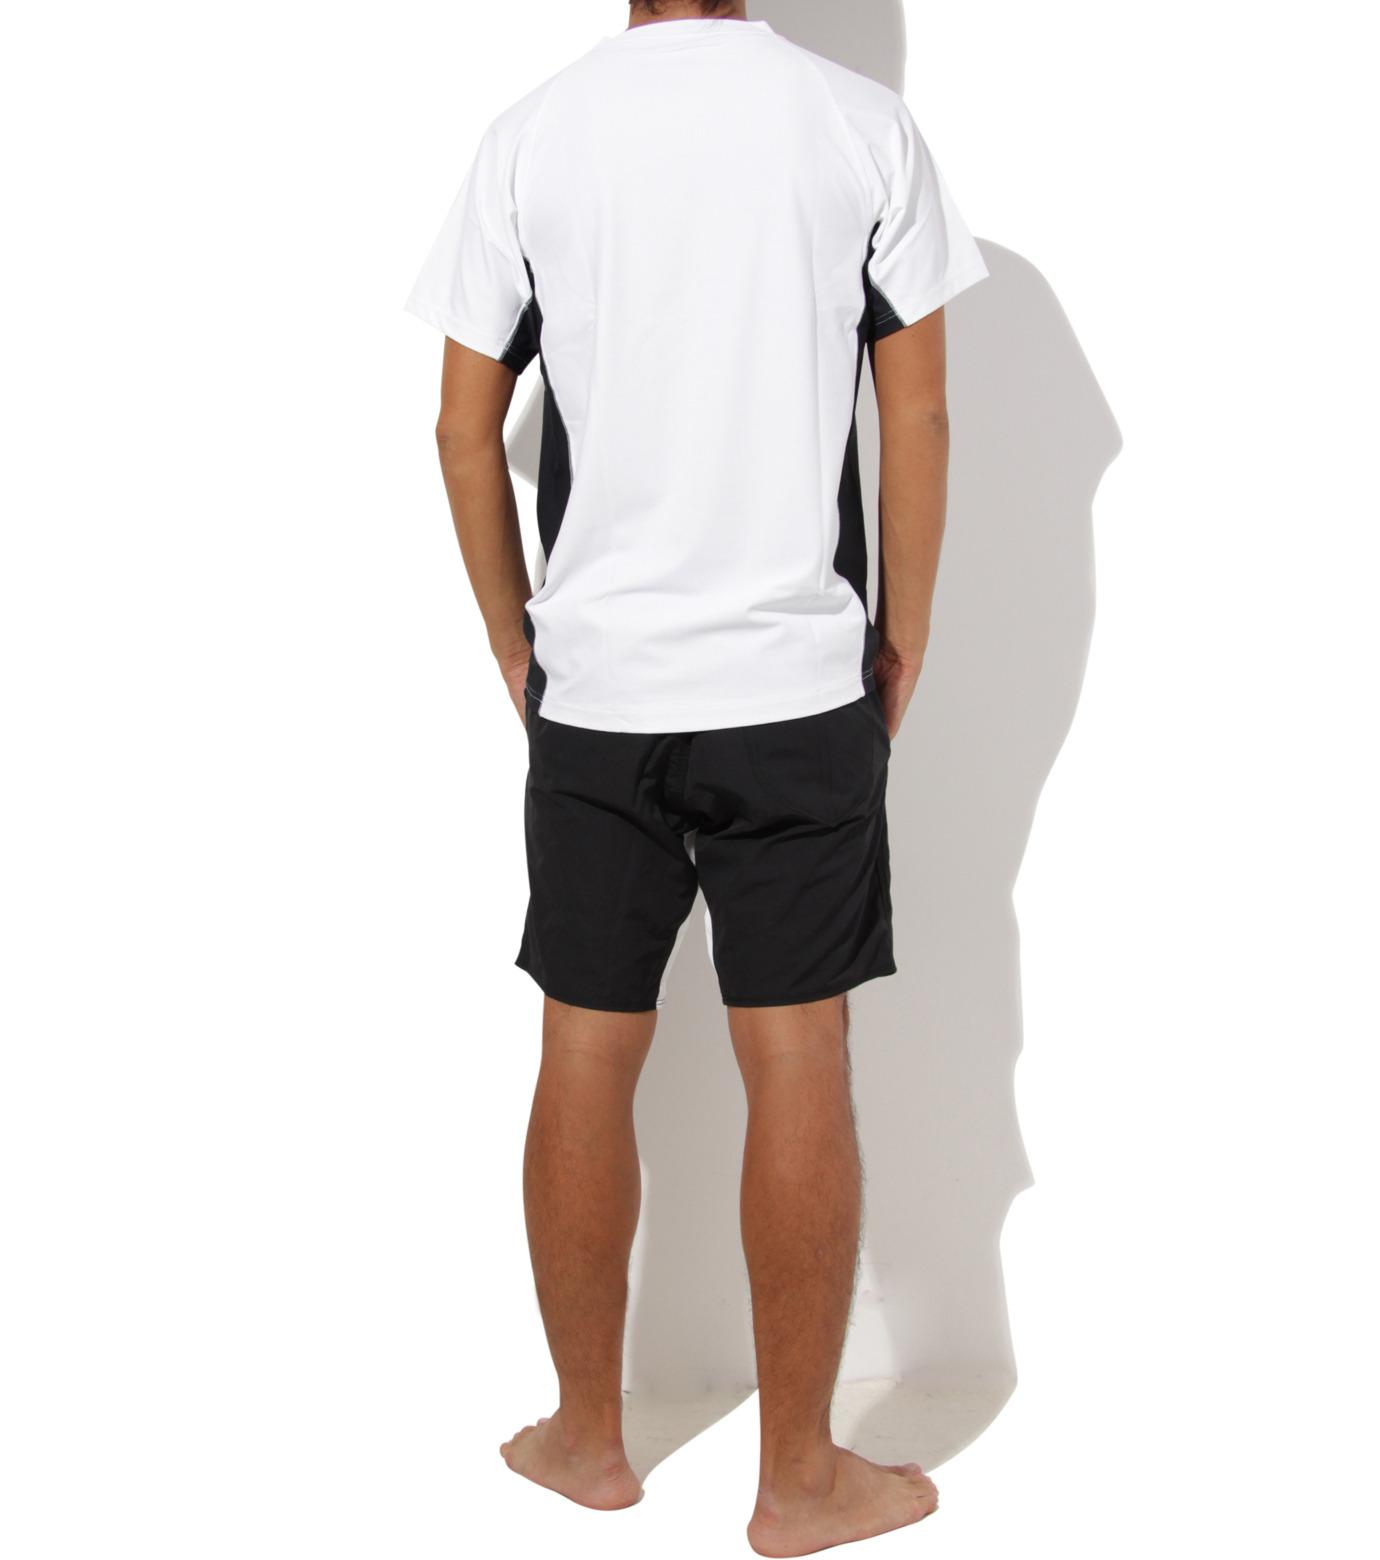 TWO TWO ONE(トゥートゥーワン)のSurf shorts short-WHITE(SWIMWEAR/SWIMWEAR)-15N948001-4 拡大詳細画像6